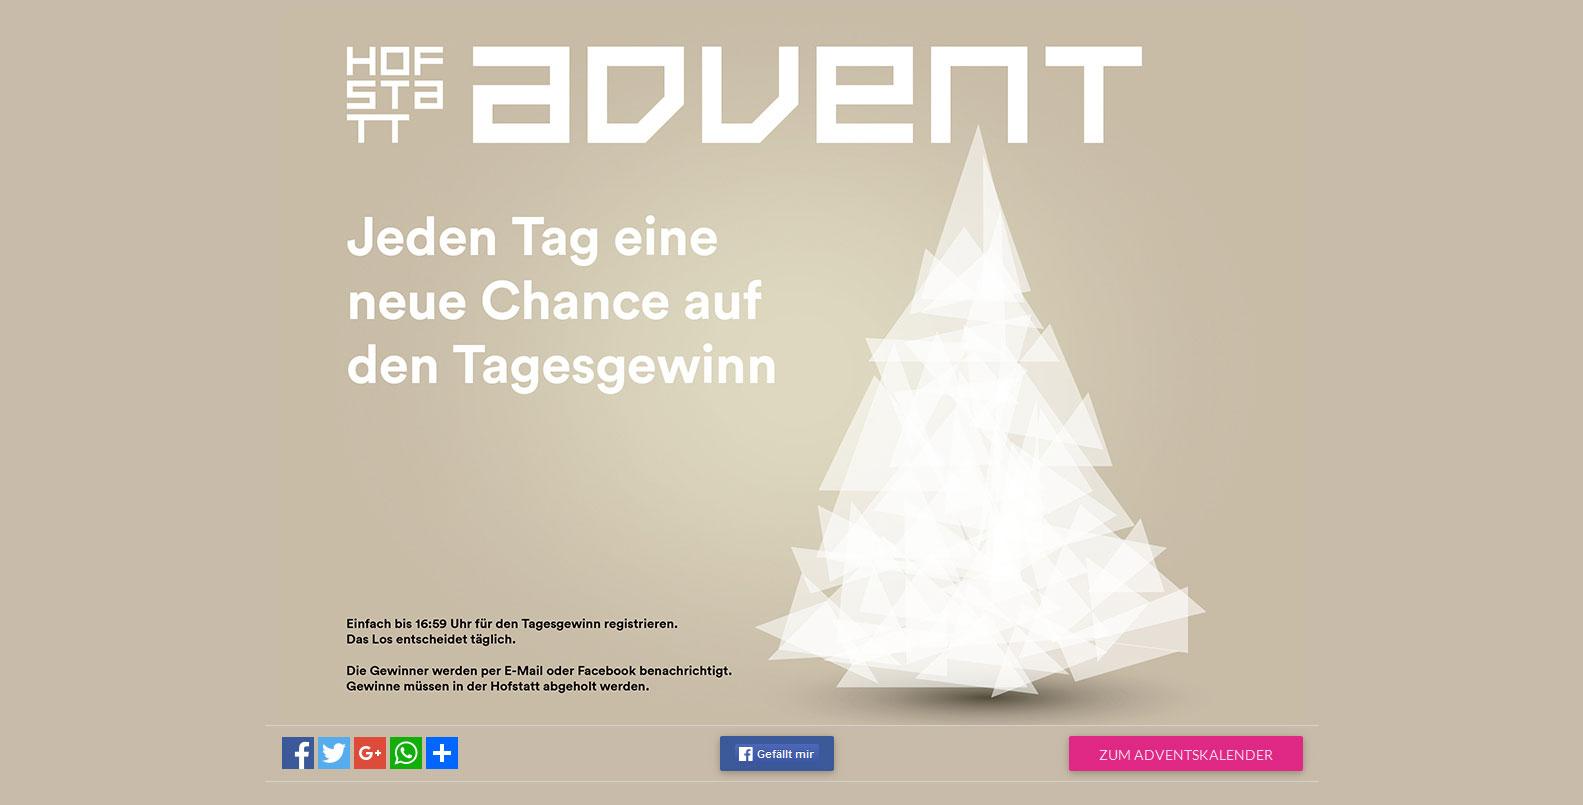 Adventskalender_Webseite_Hofstatt